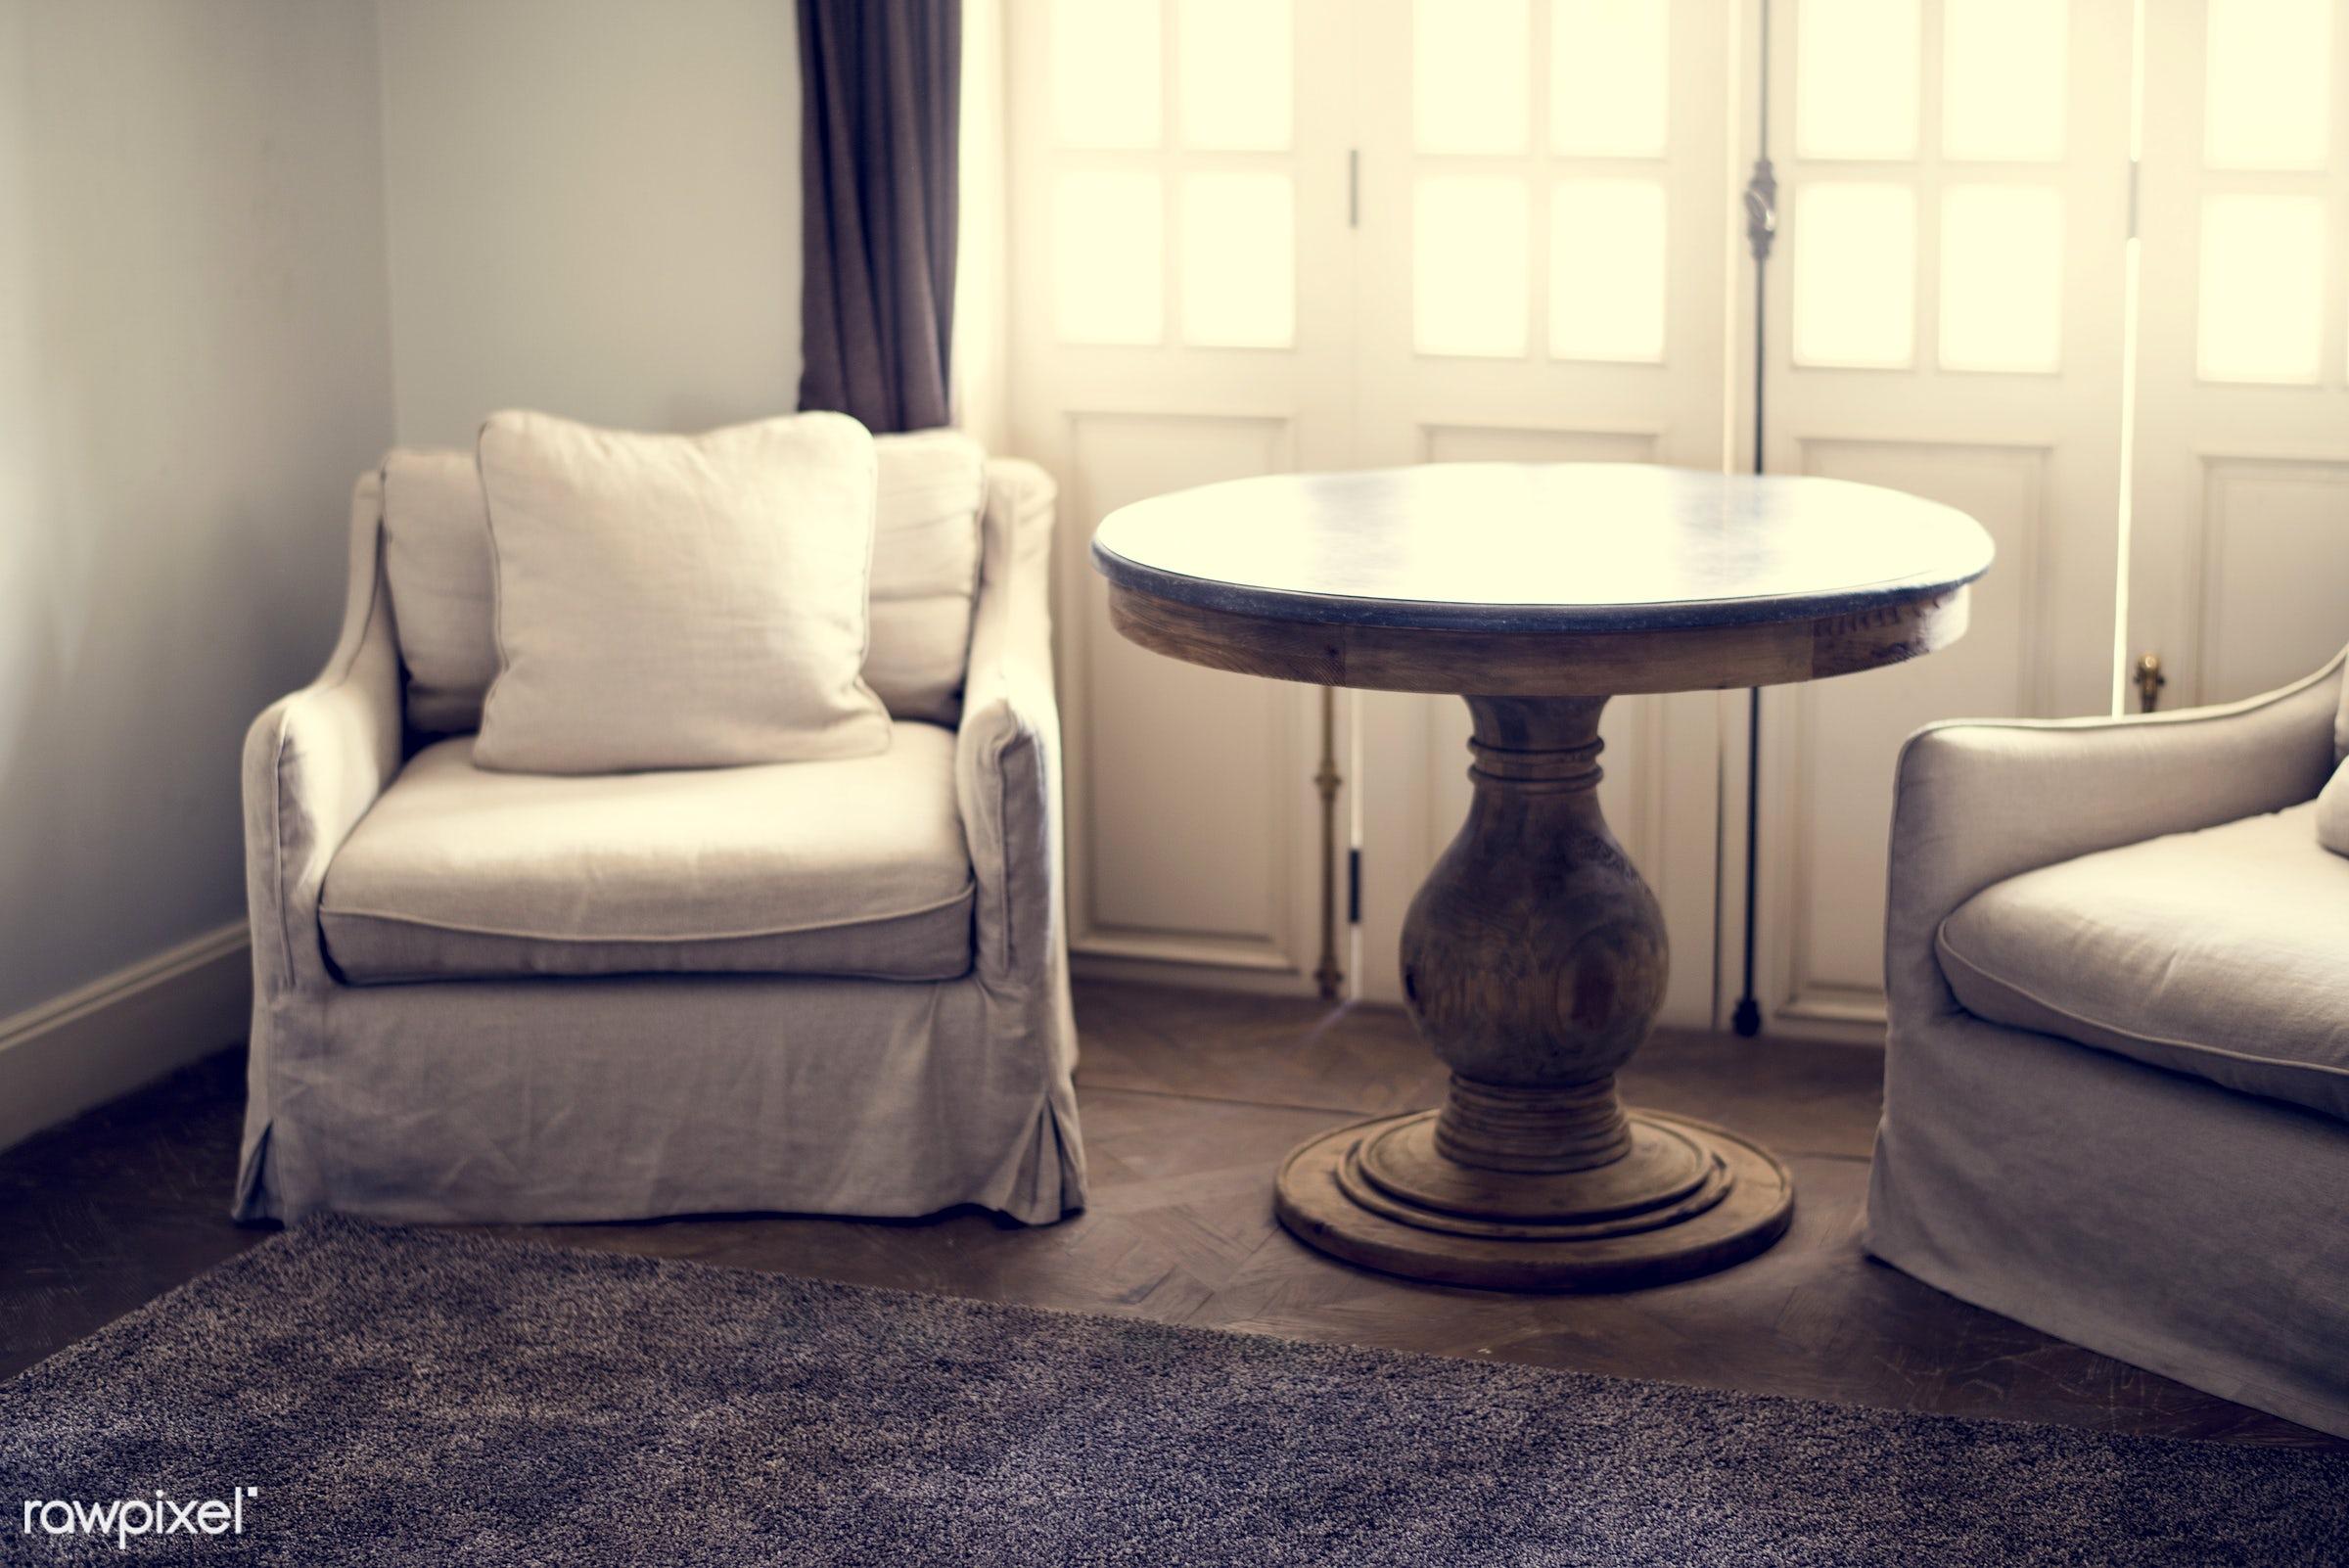 armchair, chair, classic, comfort, comfortable, comfy, contemporary, cozy, decor, decoration, design, elegance, fashion,...